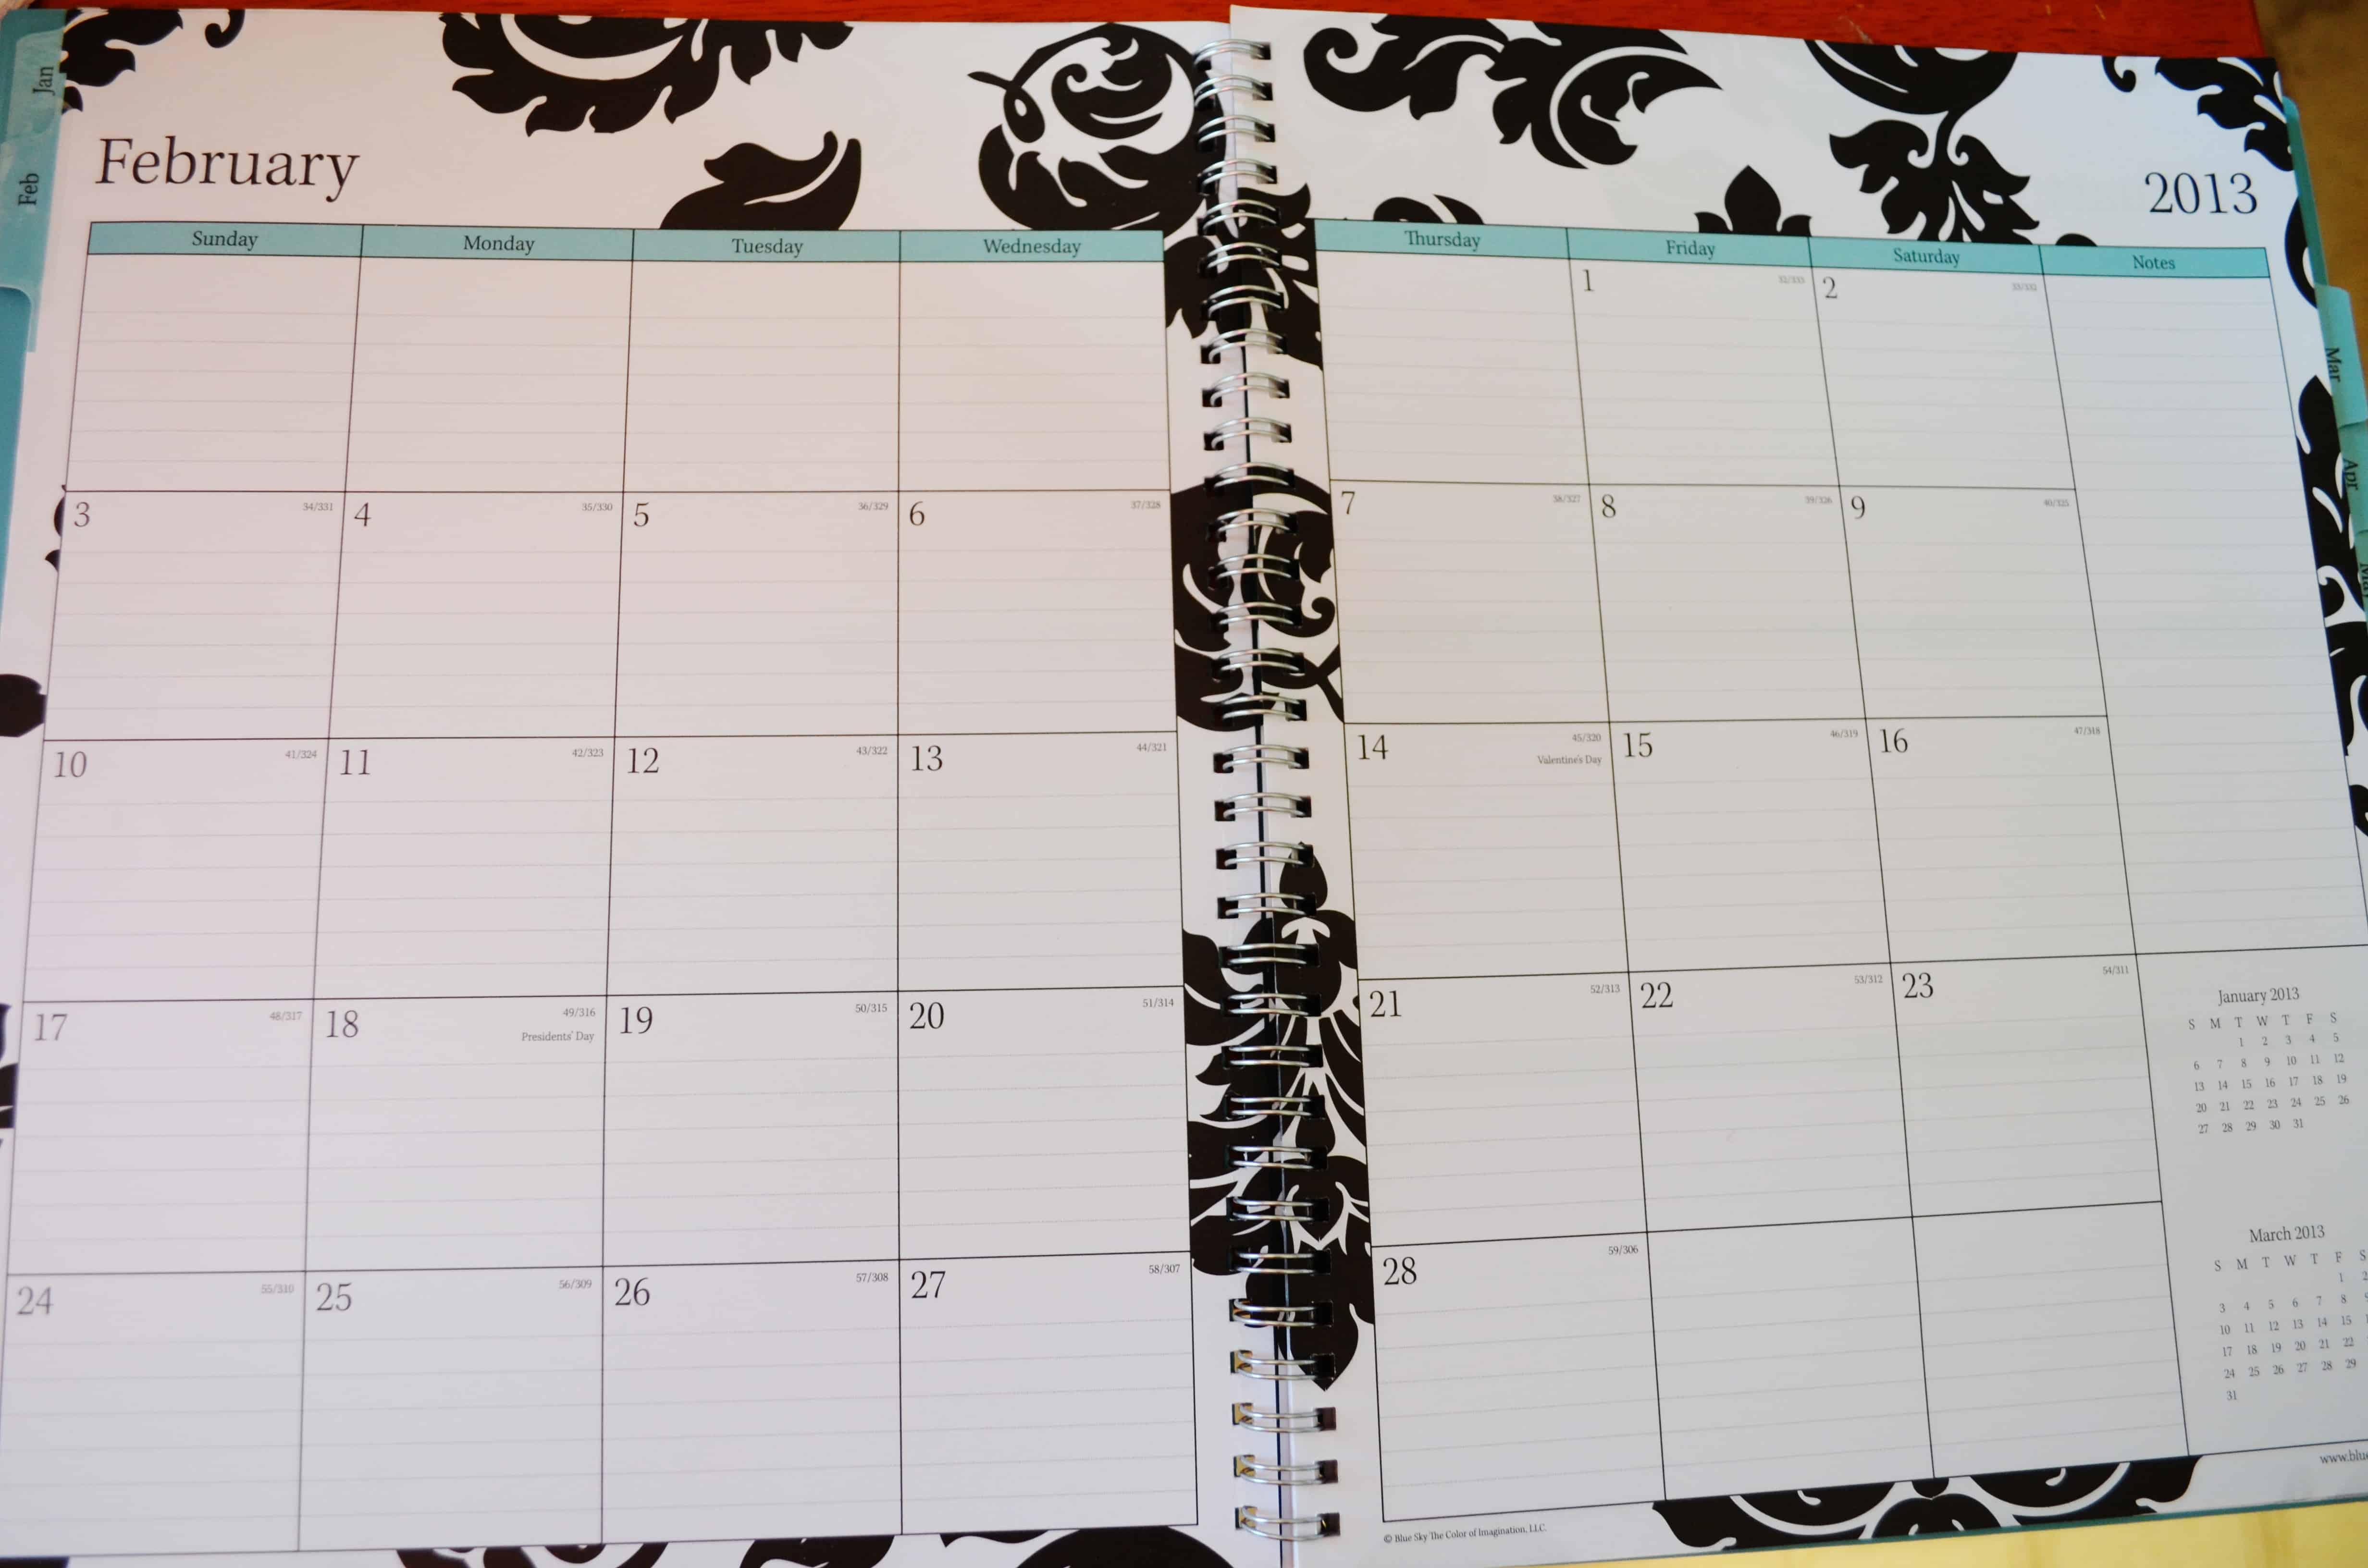 Calendar Planner Notebook : Tips for buying an organizational planner surviving a